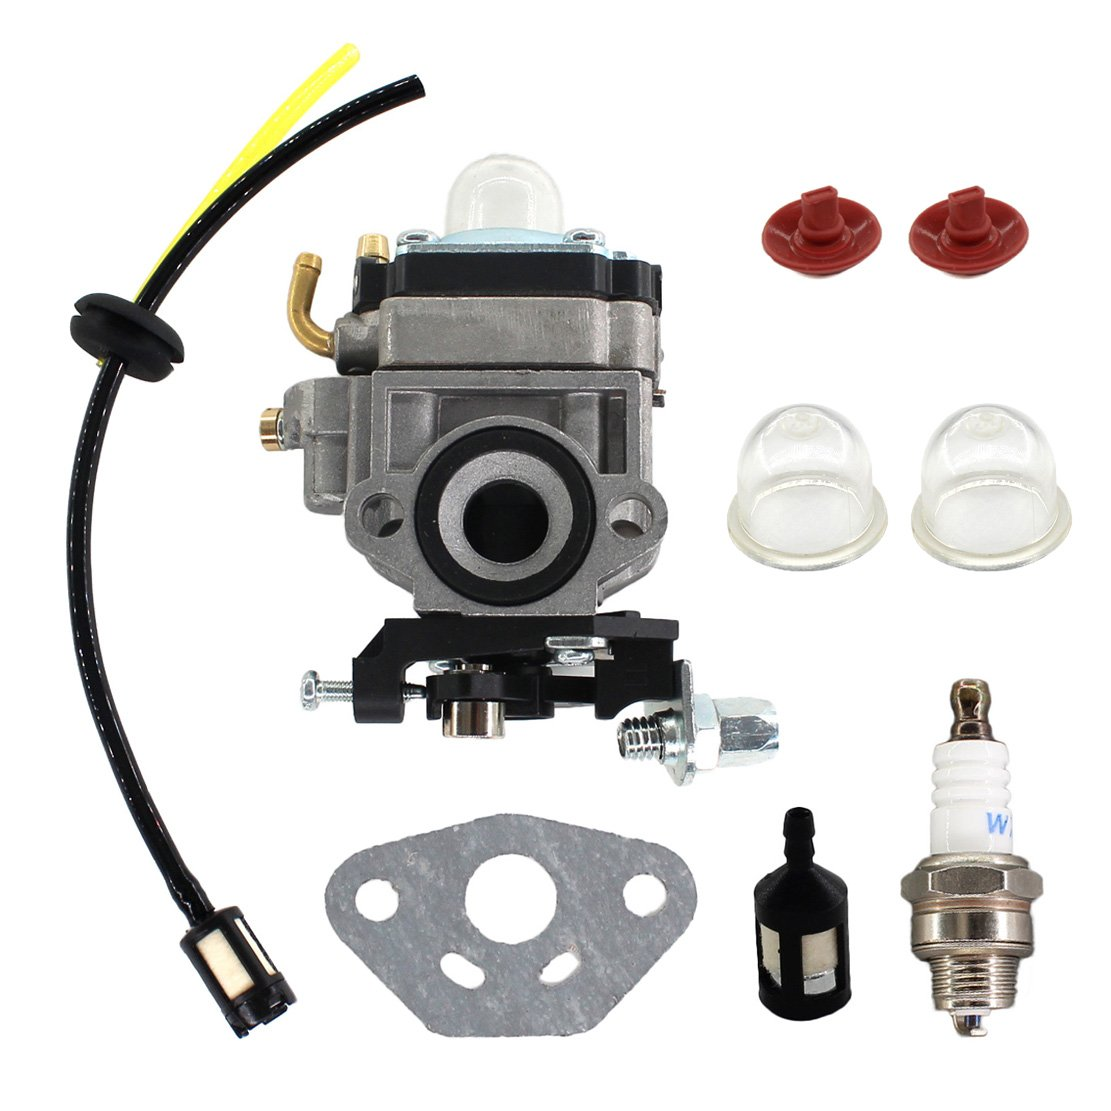 USPEEDA Carburetor for Tanaka PF4000 39.8 40CC 41CC 41.5CC Bladez Moby XL40 Power Kart G4000 Fuel Line Tune Up Kit